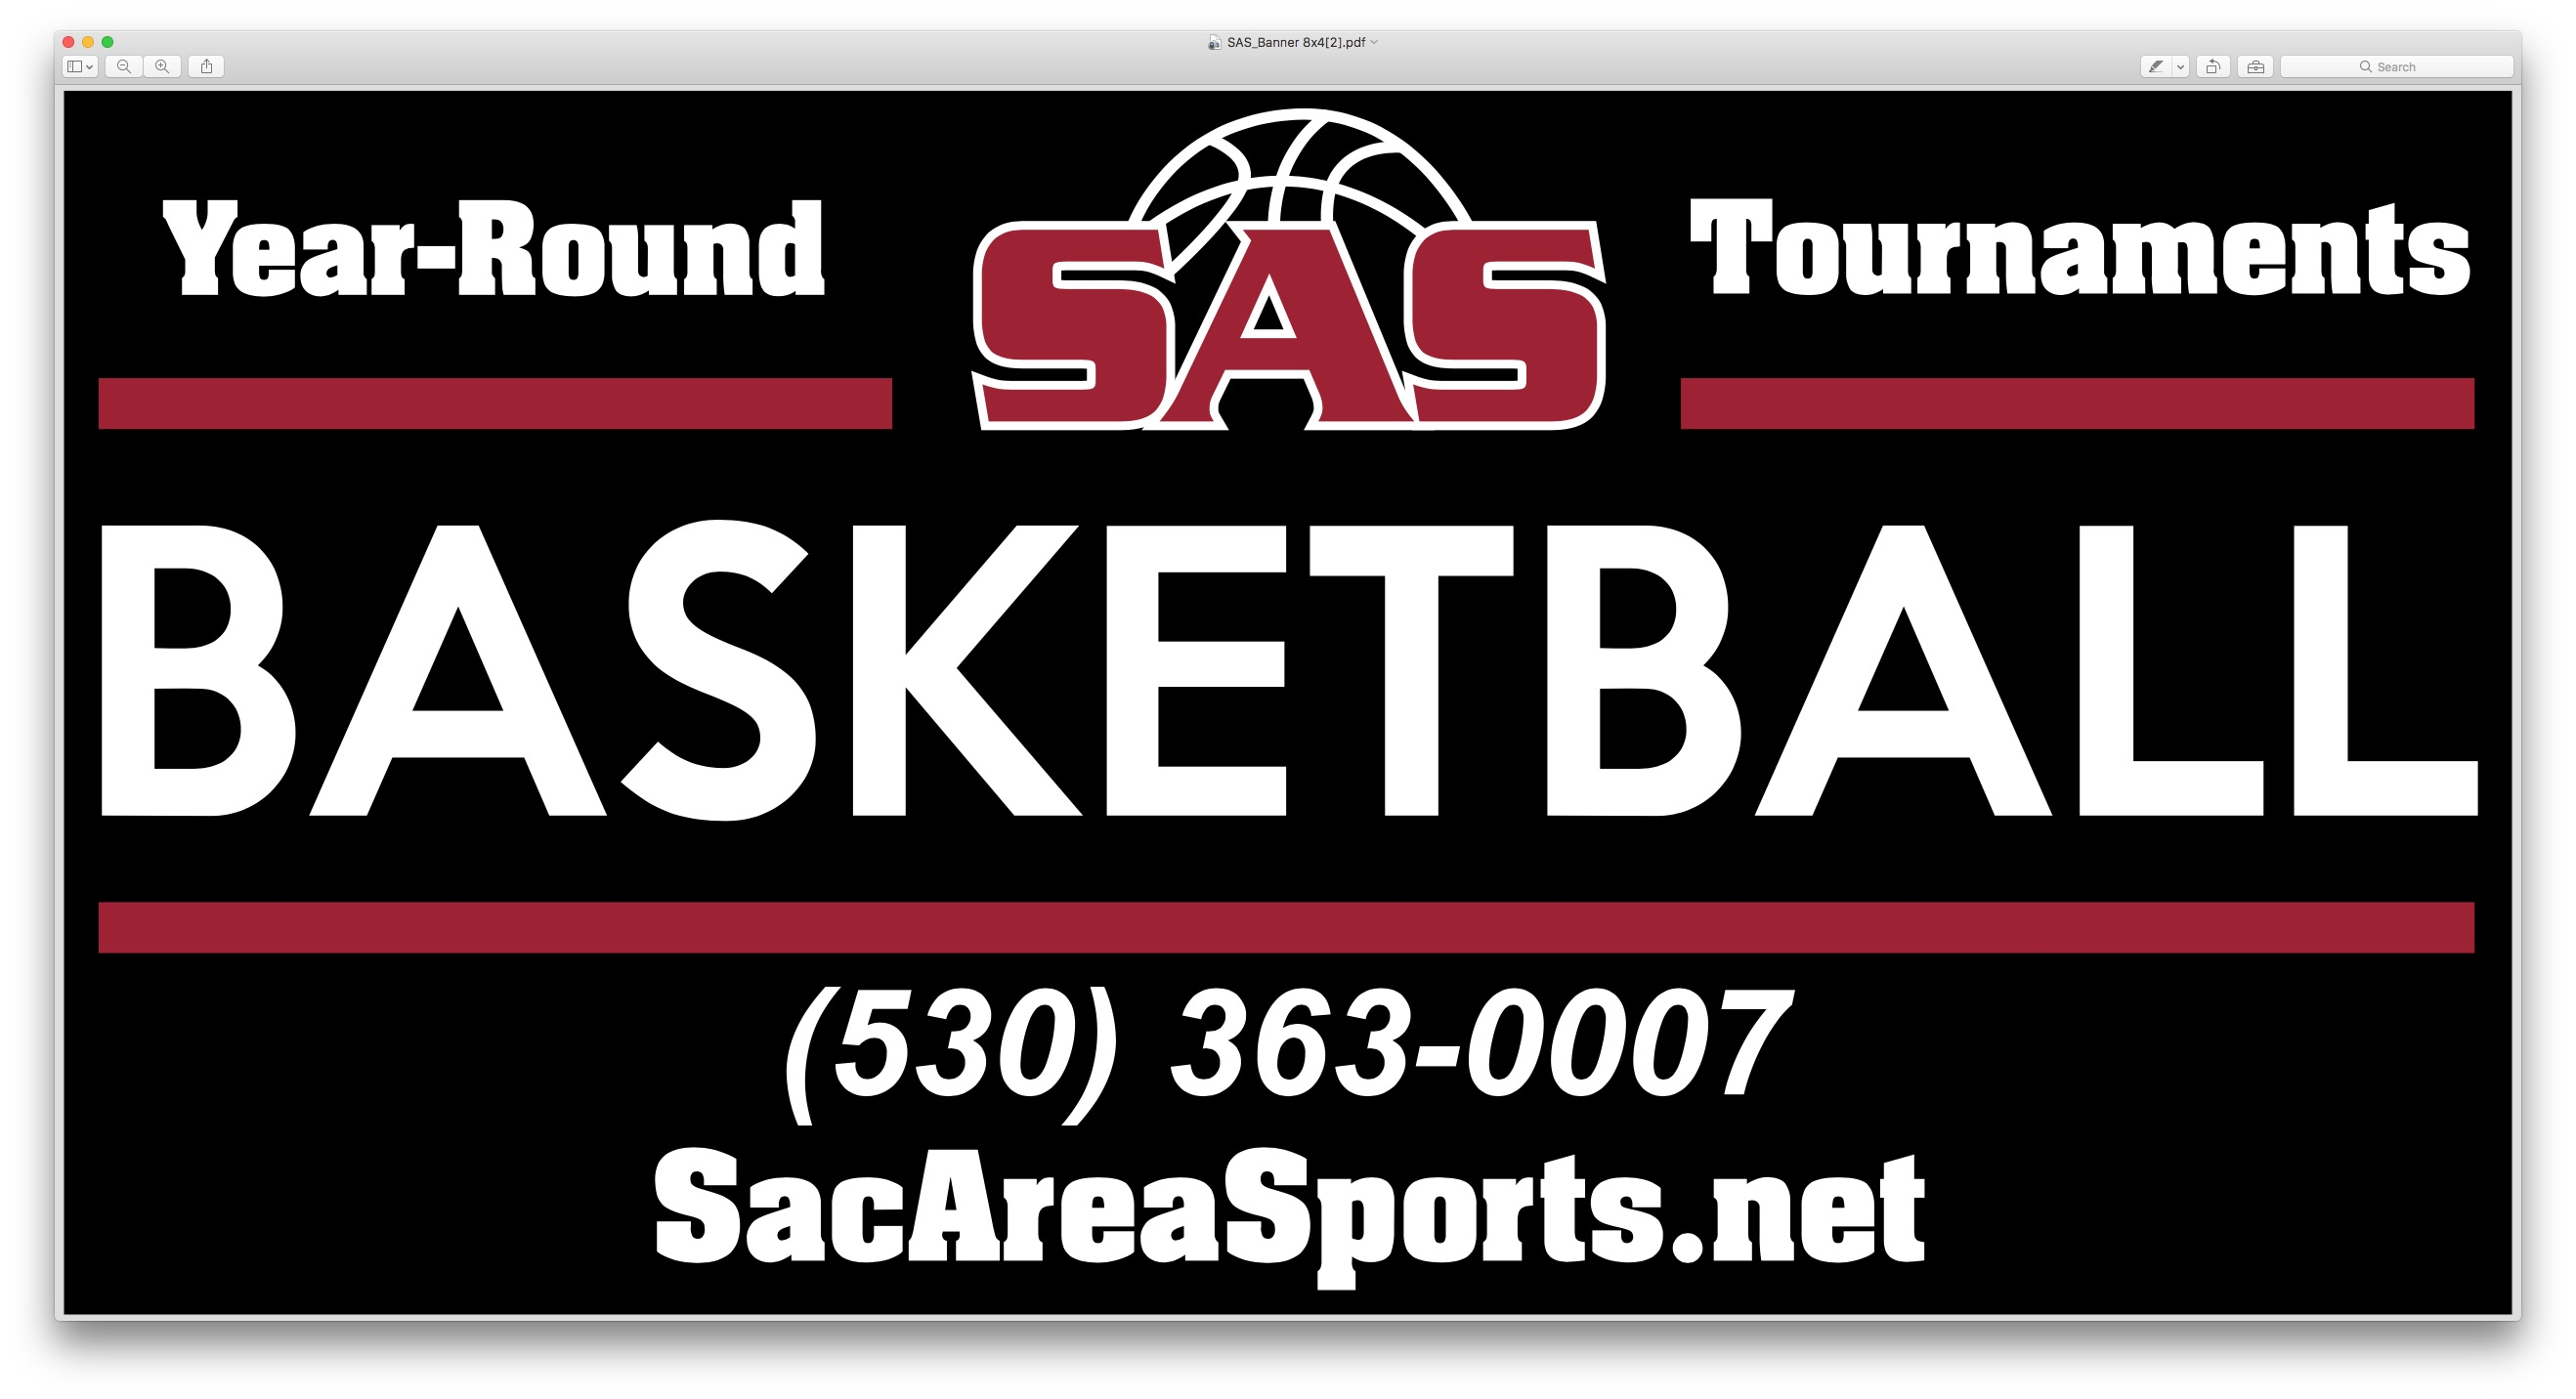 SAS Saturday Basketball Tournaments $125 per team